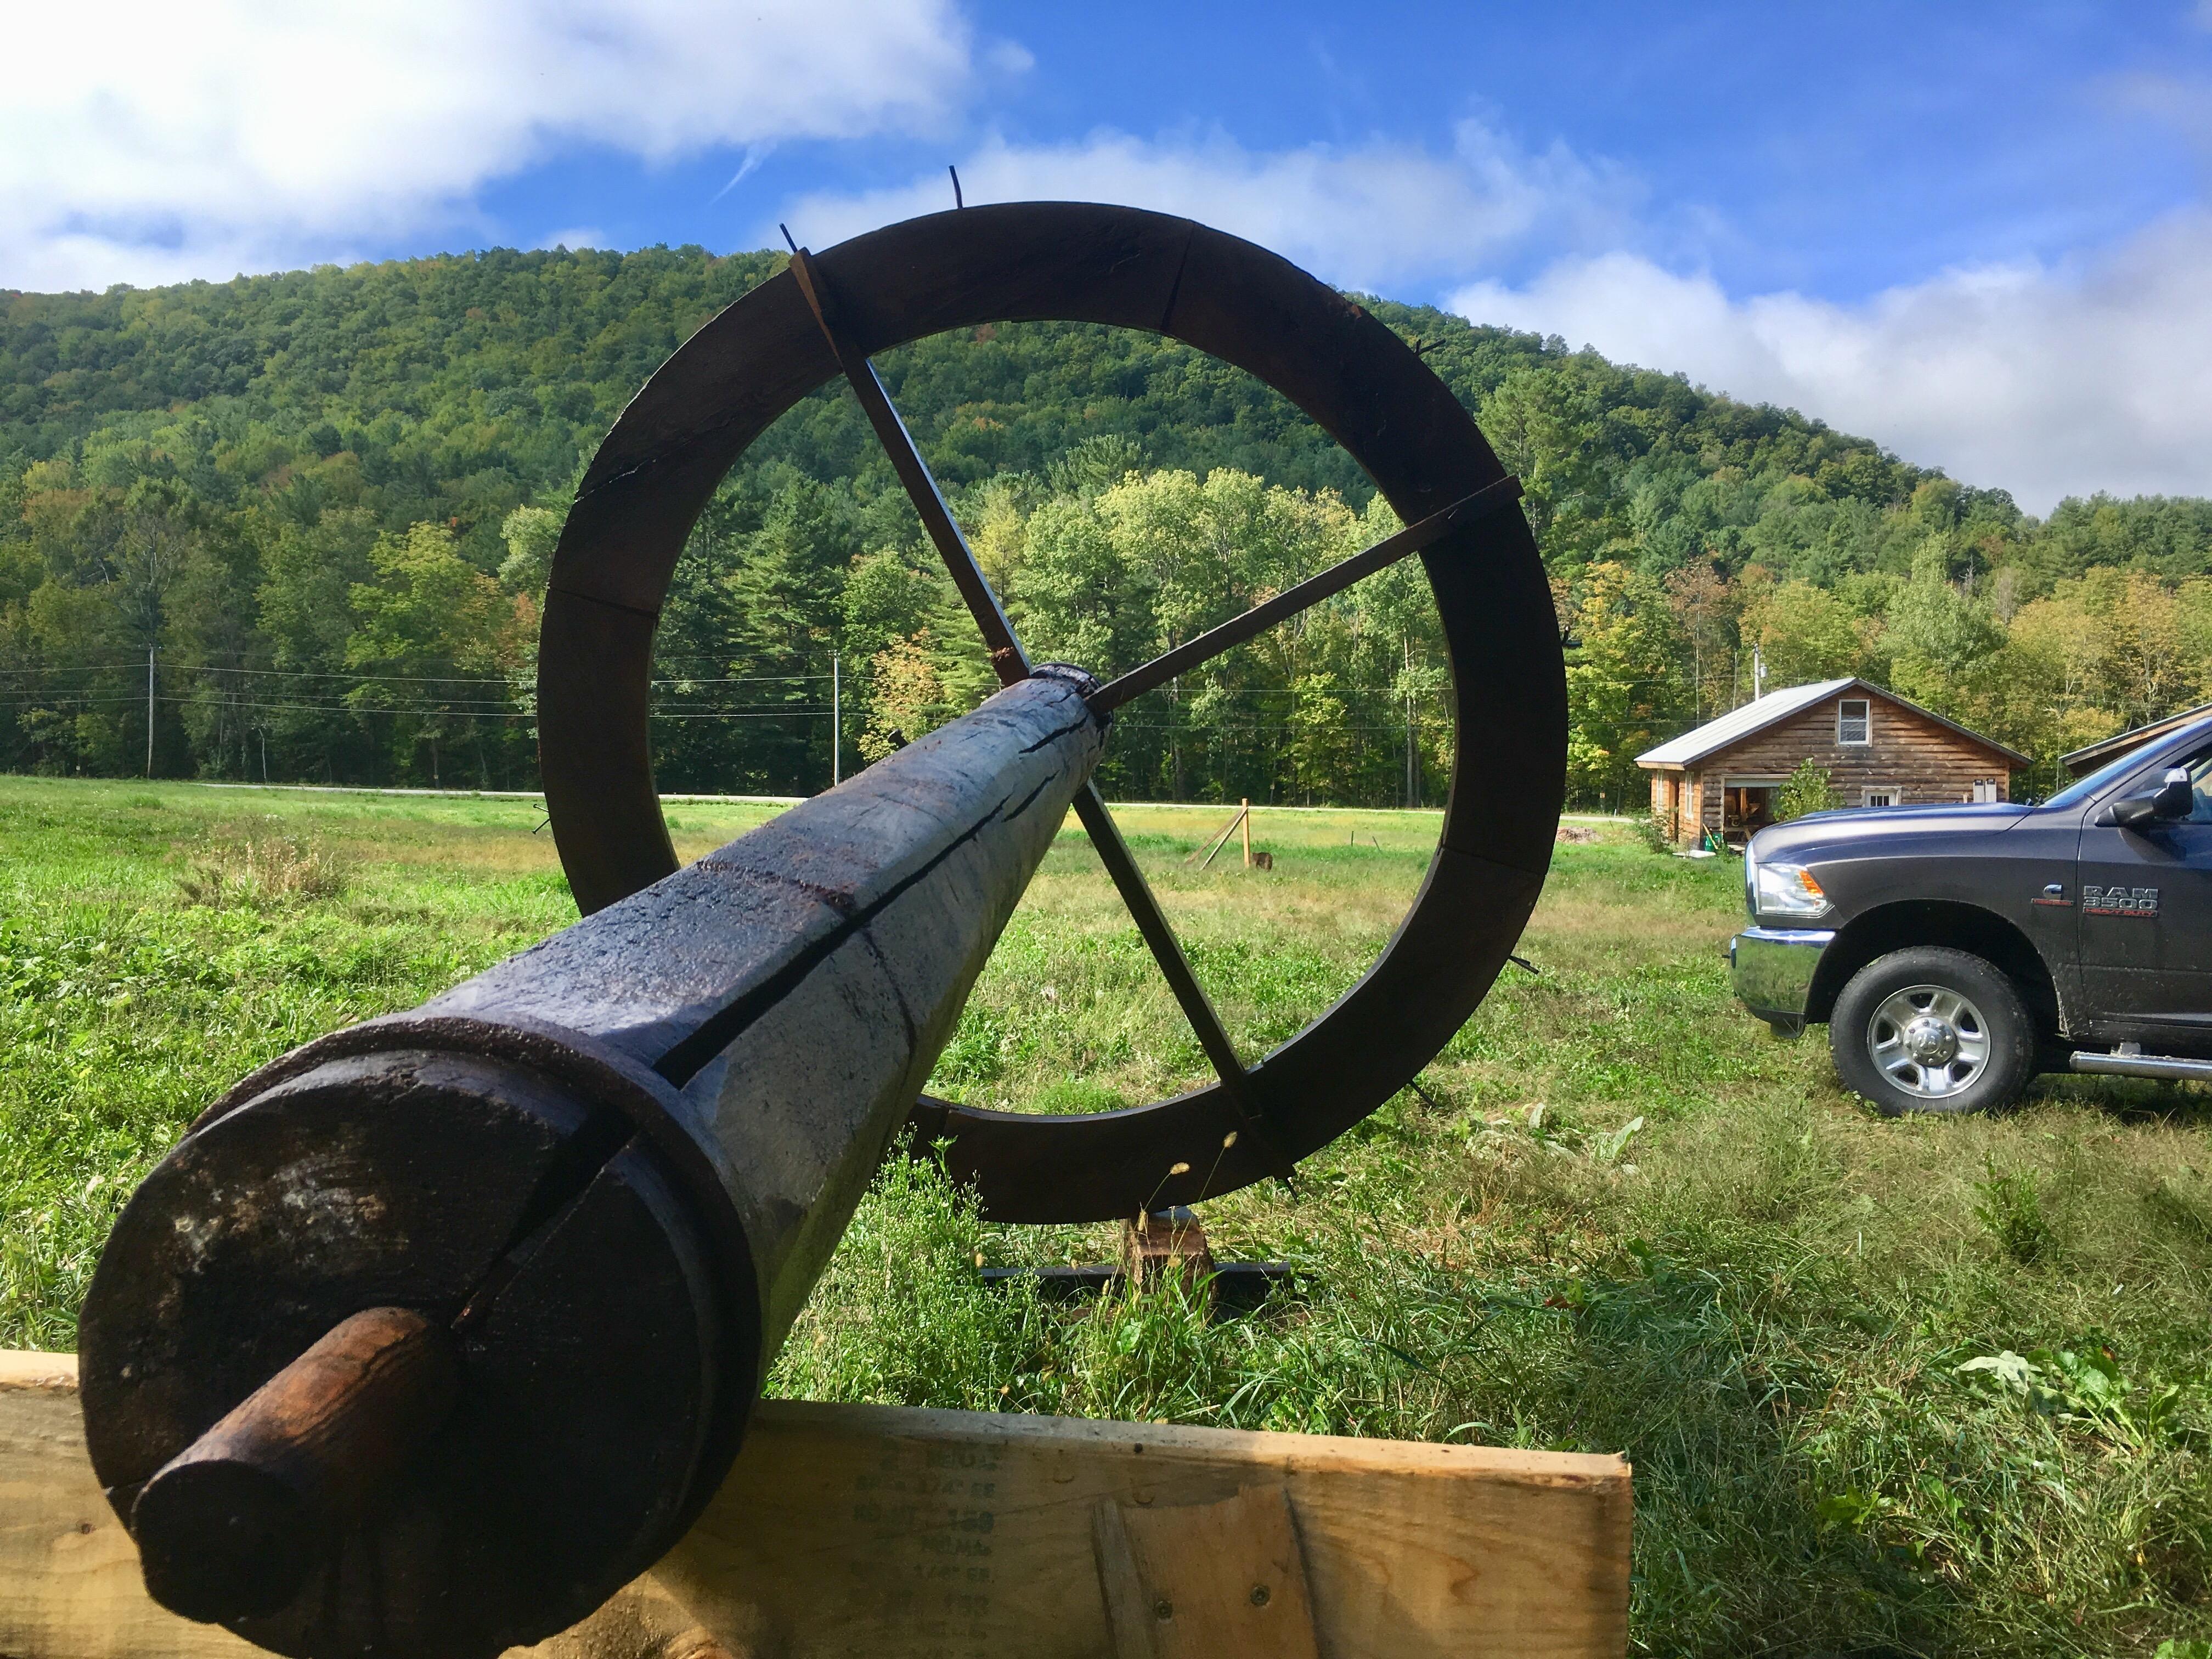 hoist of antique slaughter wheel green mountain timber frames